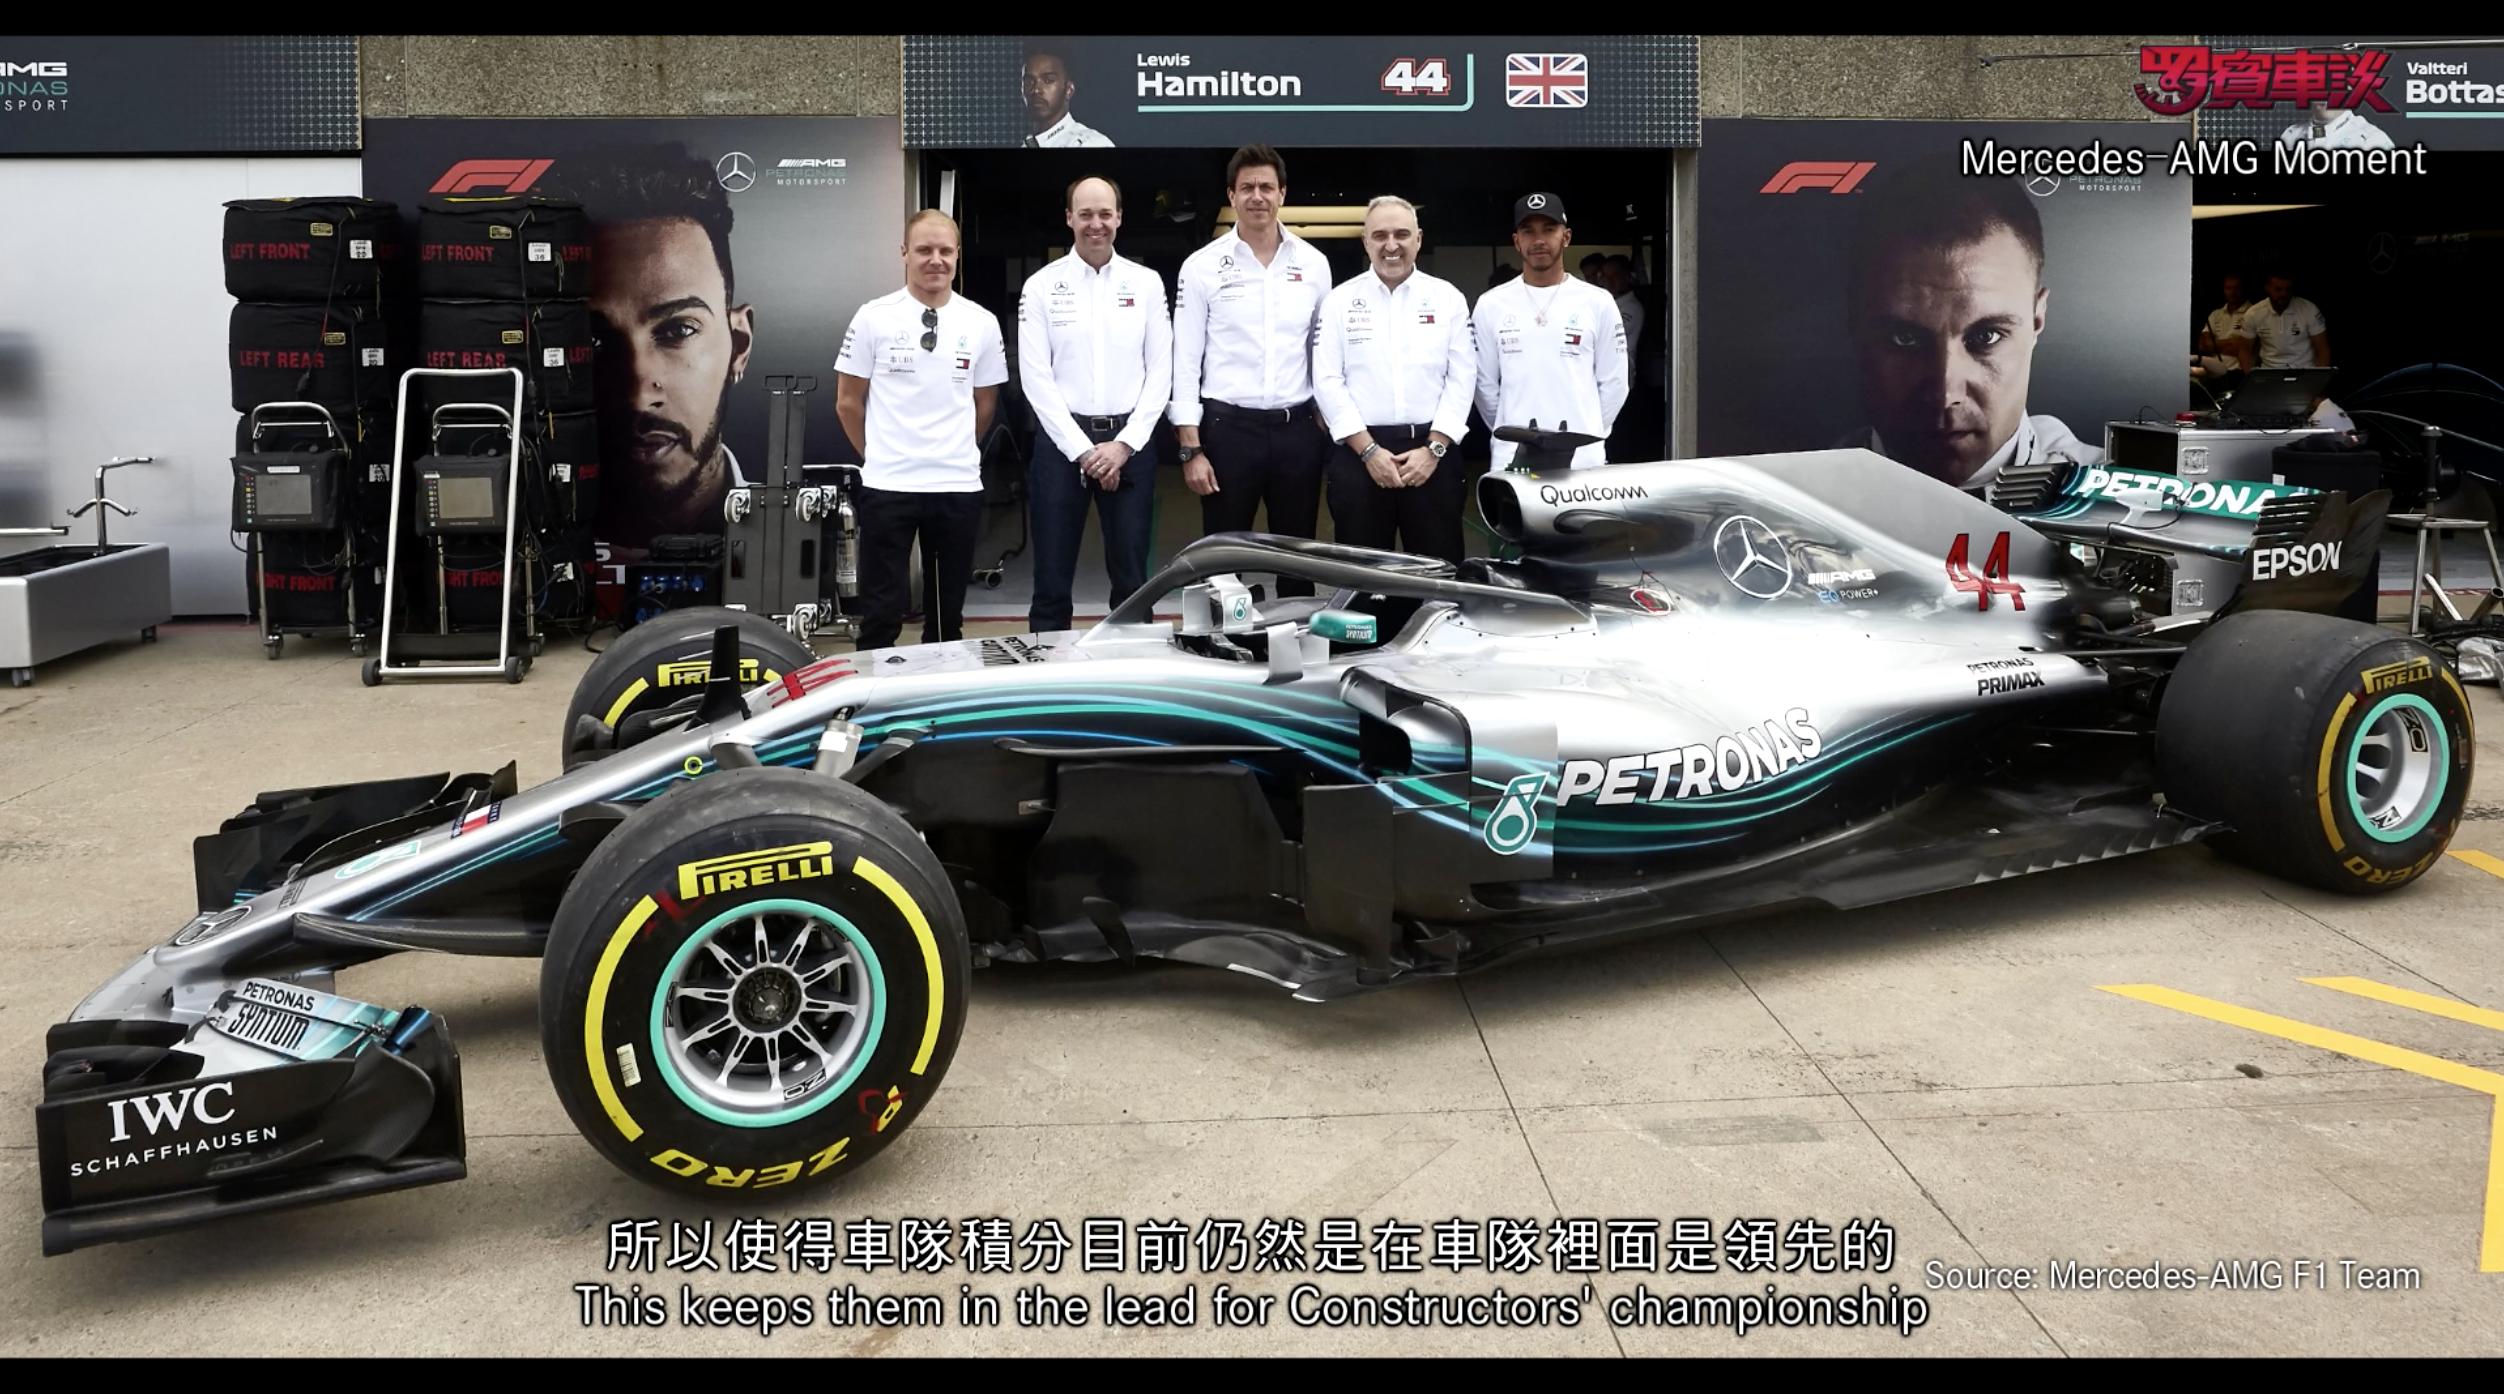 【Mercedes-AMG Moment】2018 F1賽季加拿大蒙特婁站賽後分析